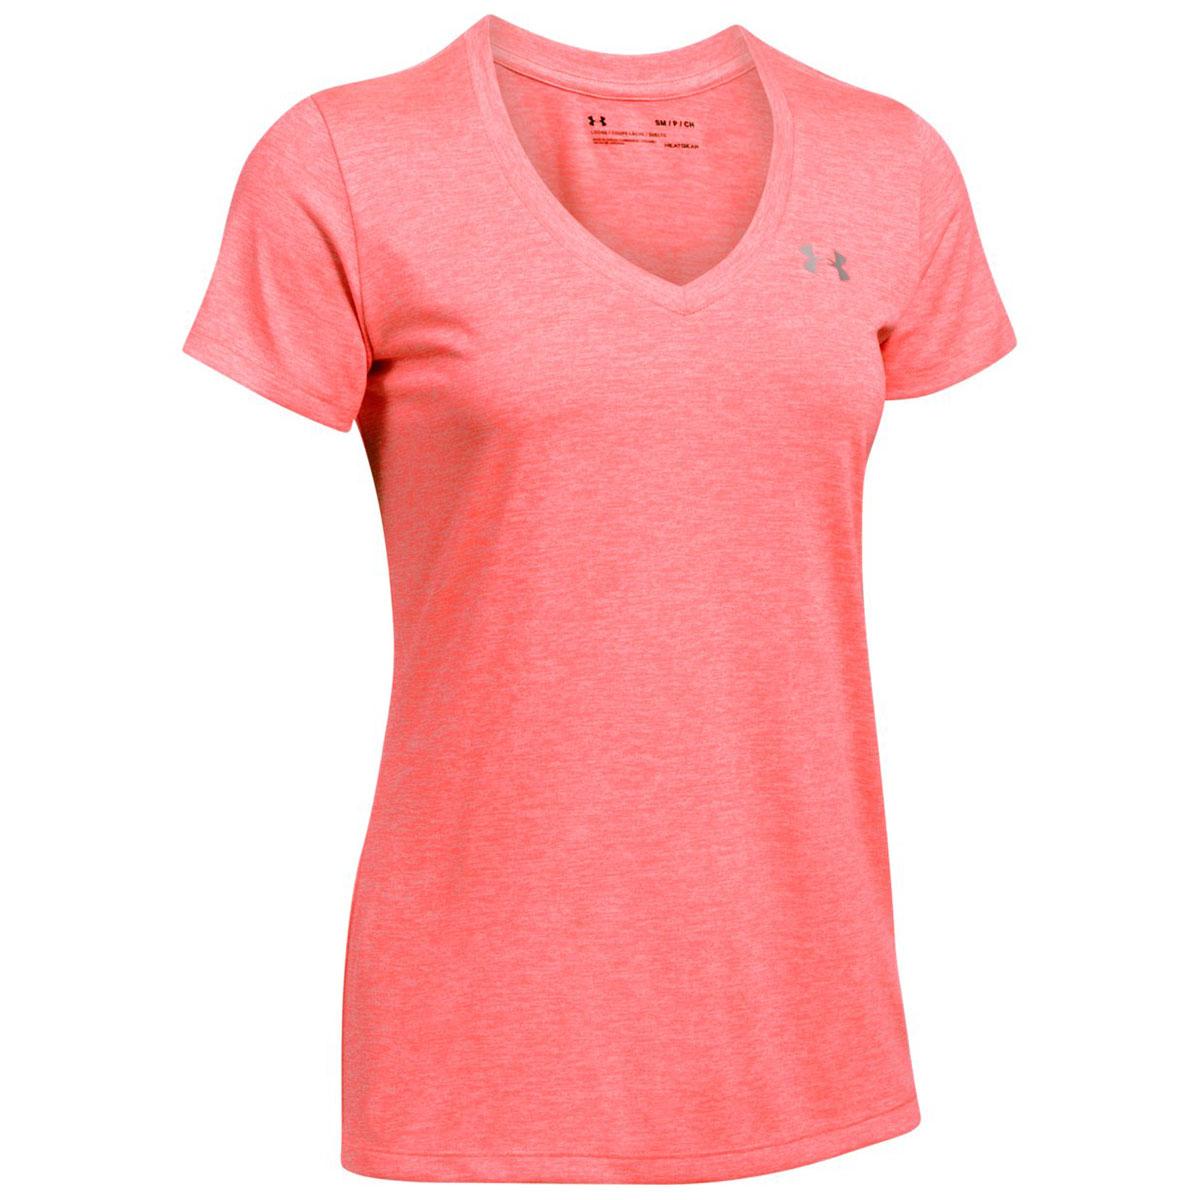 Under-Armour-Womens-2018-UA-Twist-Tech-V-Neck-T-Shirt-Short-Sleeve-Gym-Sport-Tee